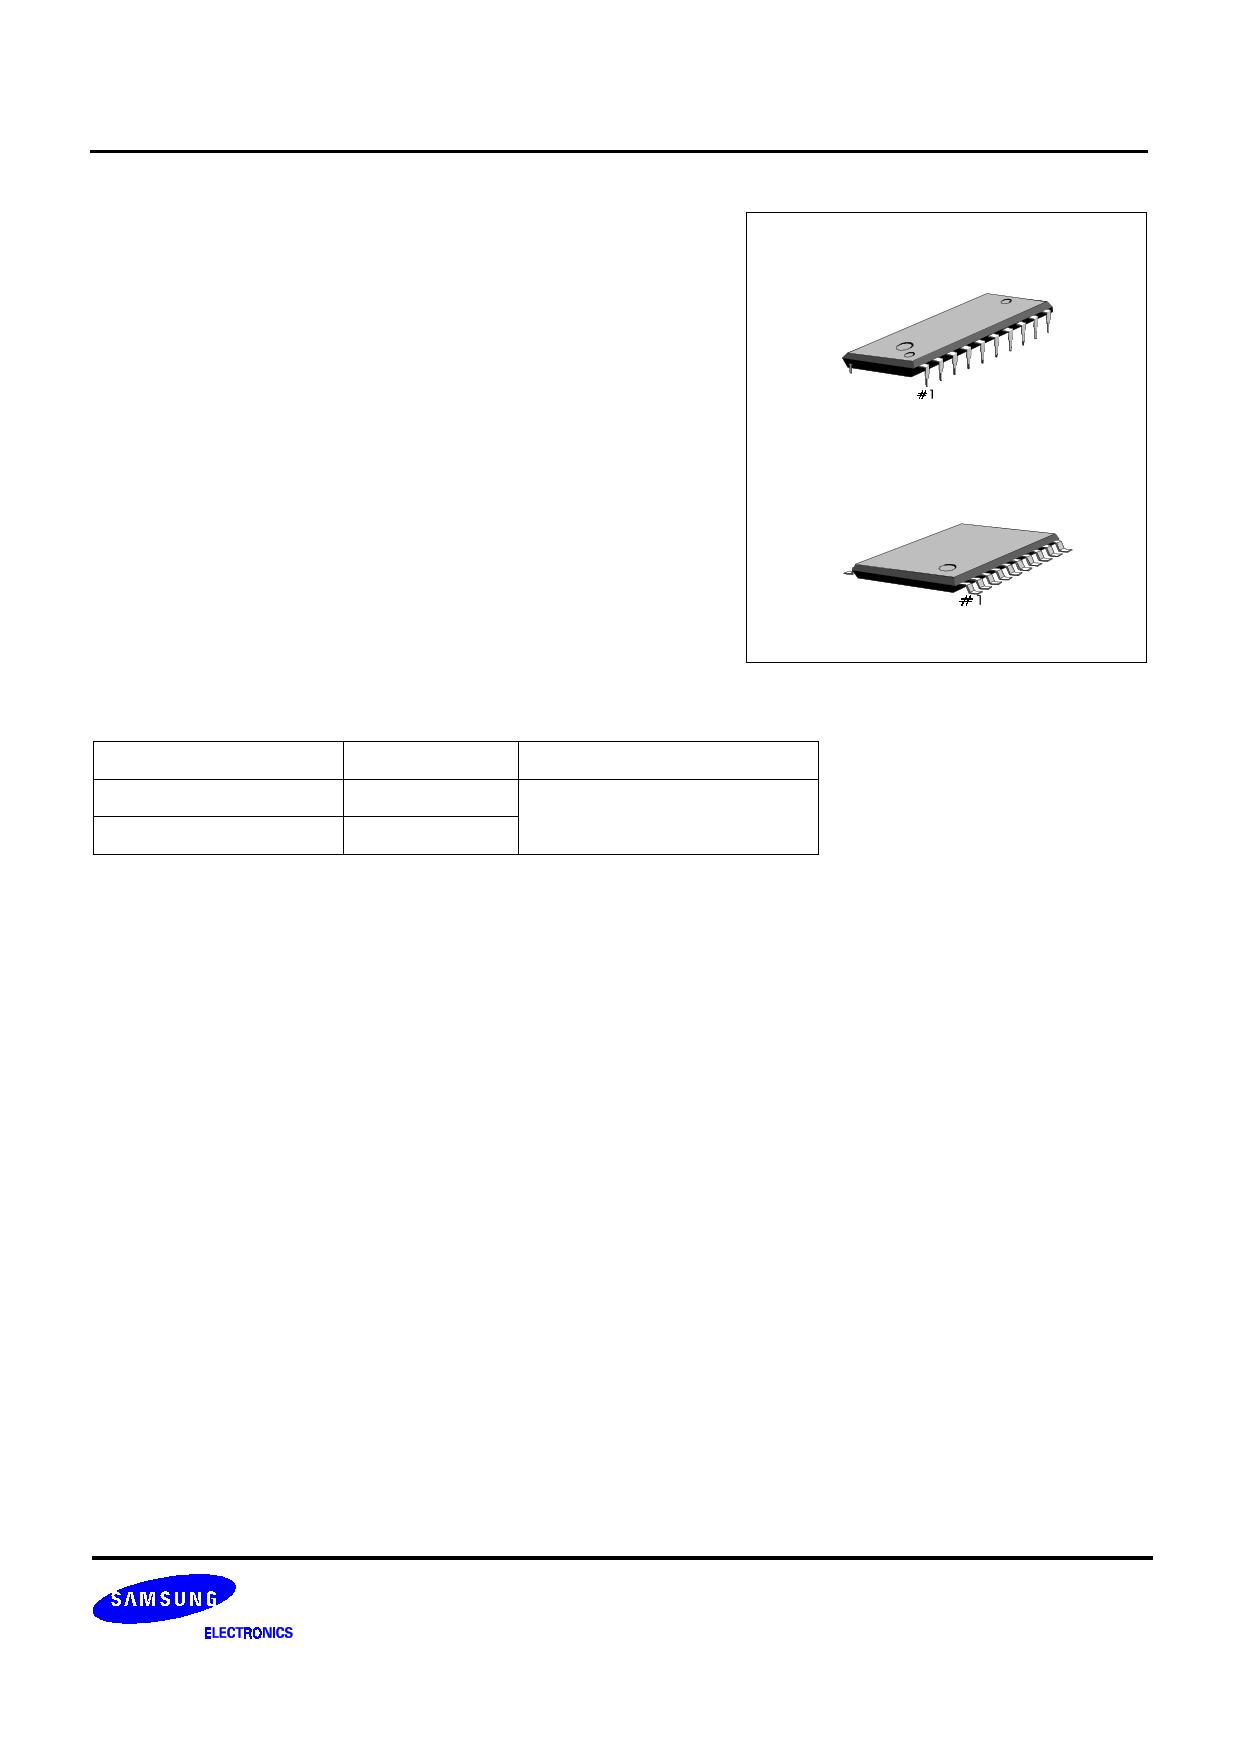 S1T8507C01-S0B0 데이터시트 및 S1T8507C01-S0B0 PDF